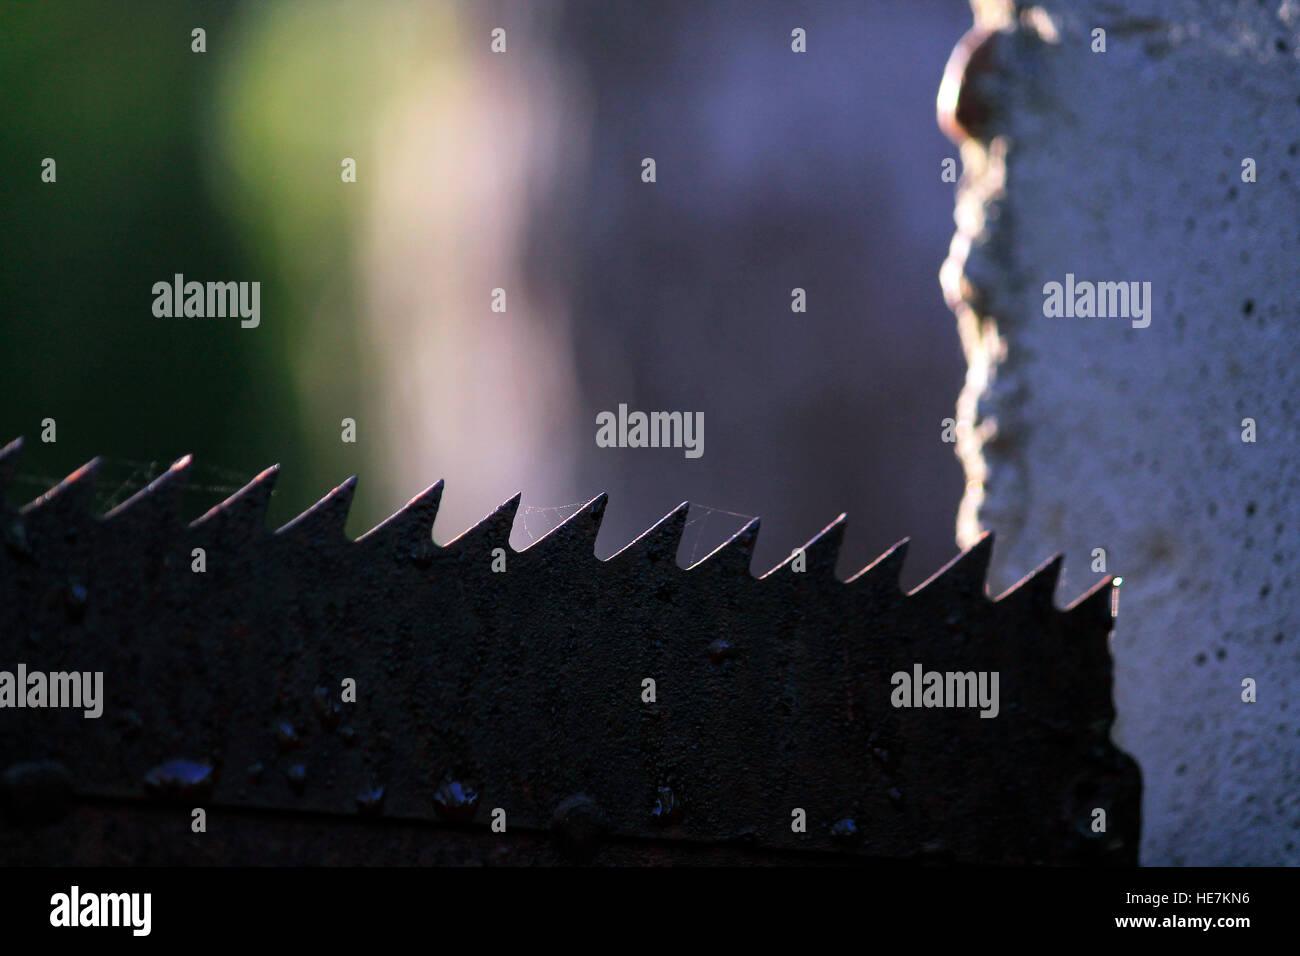 Blade - Stock Image